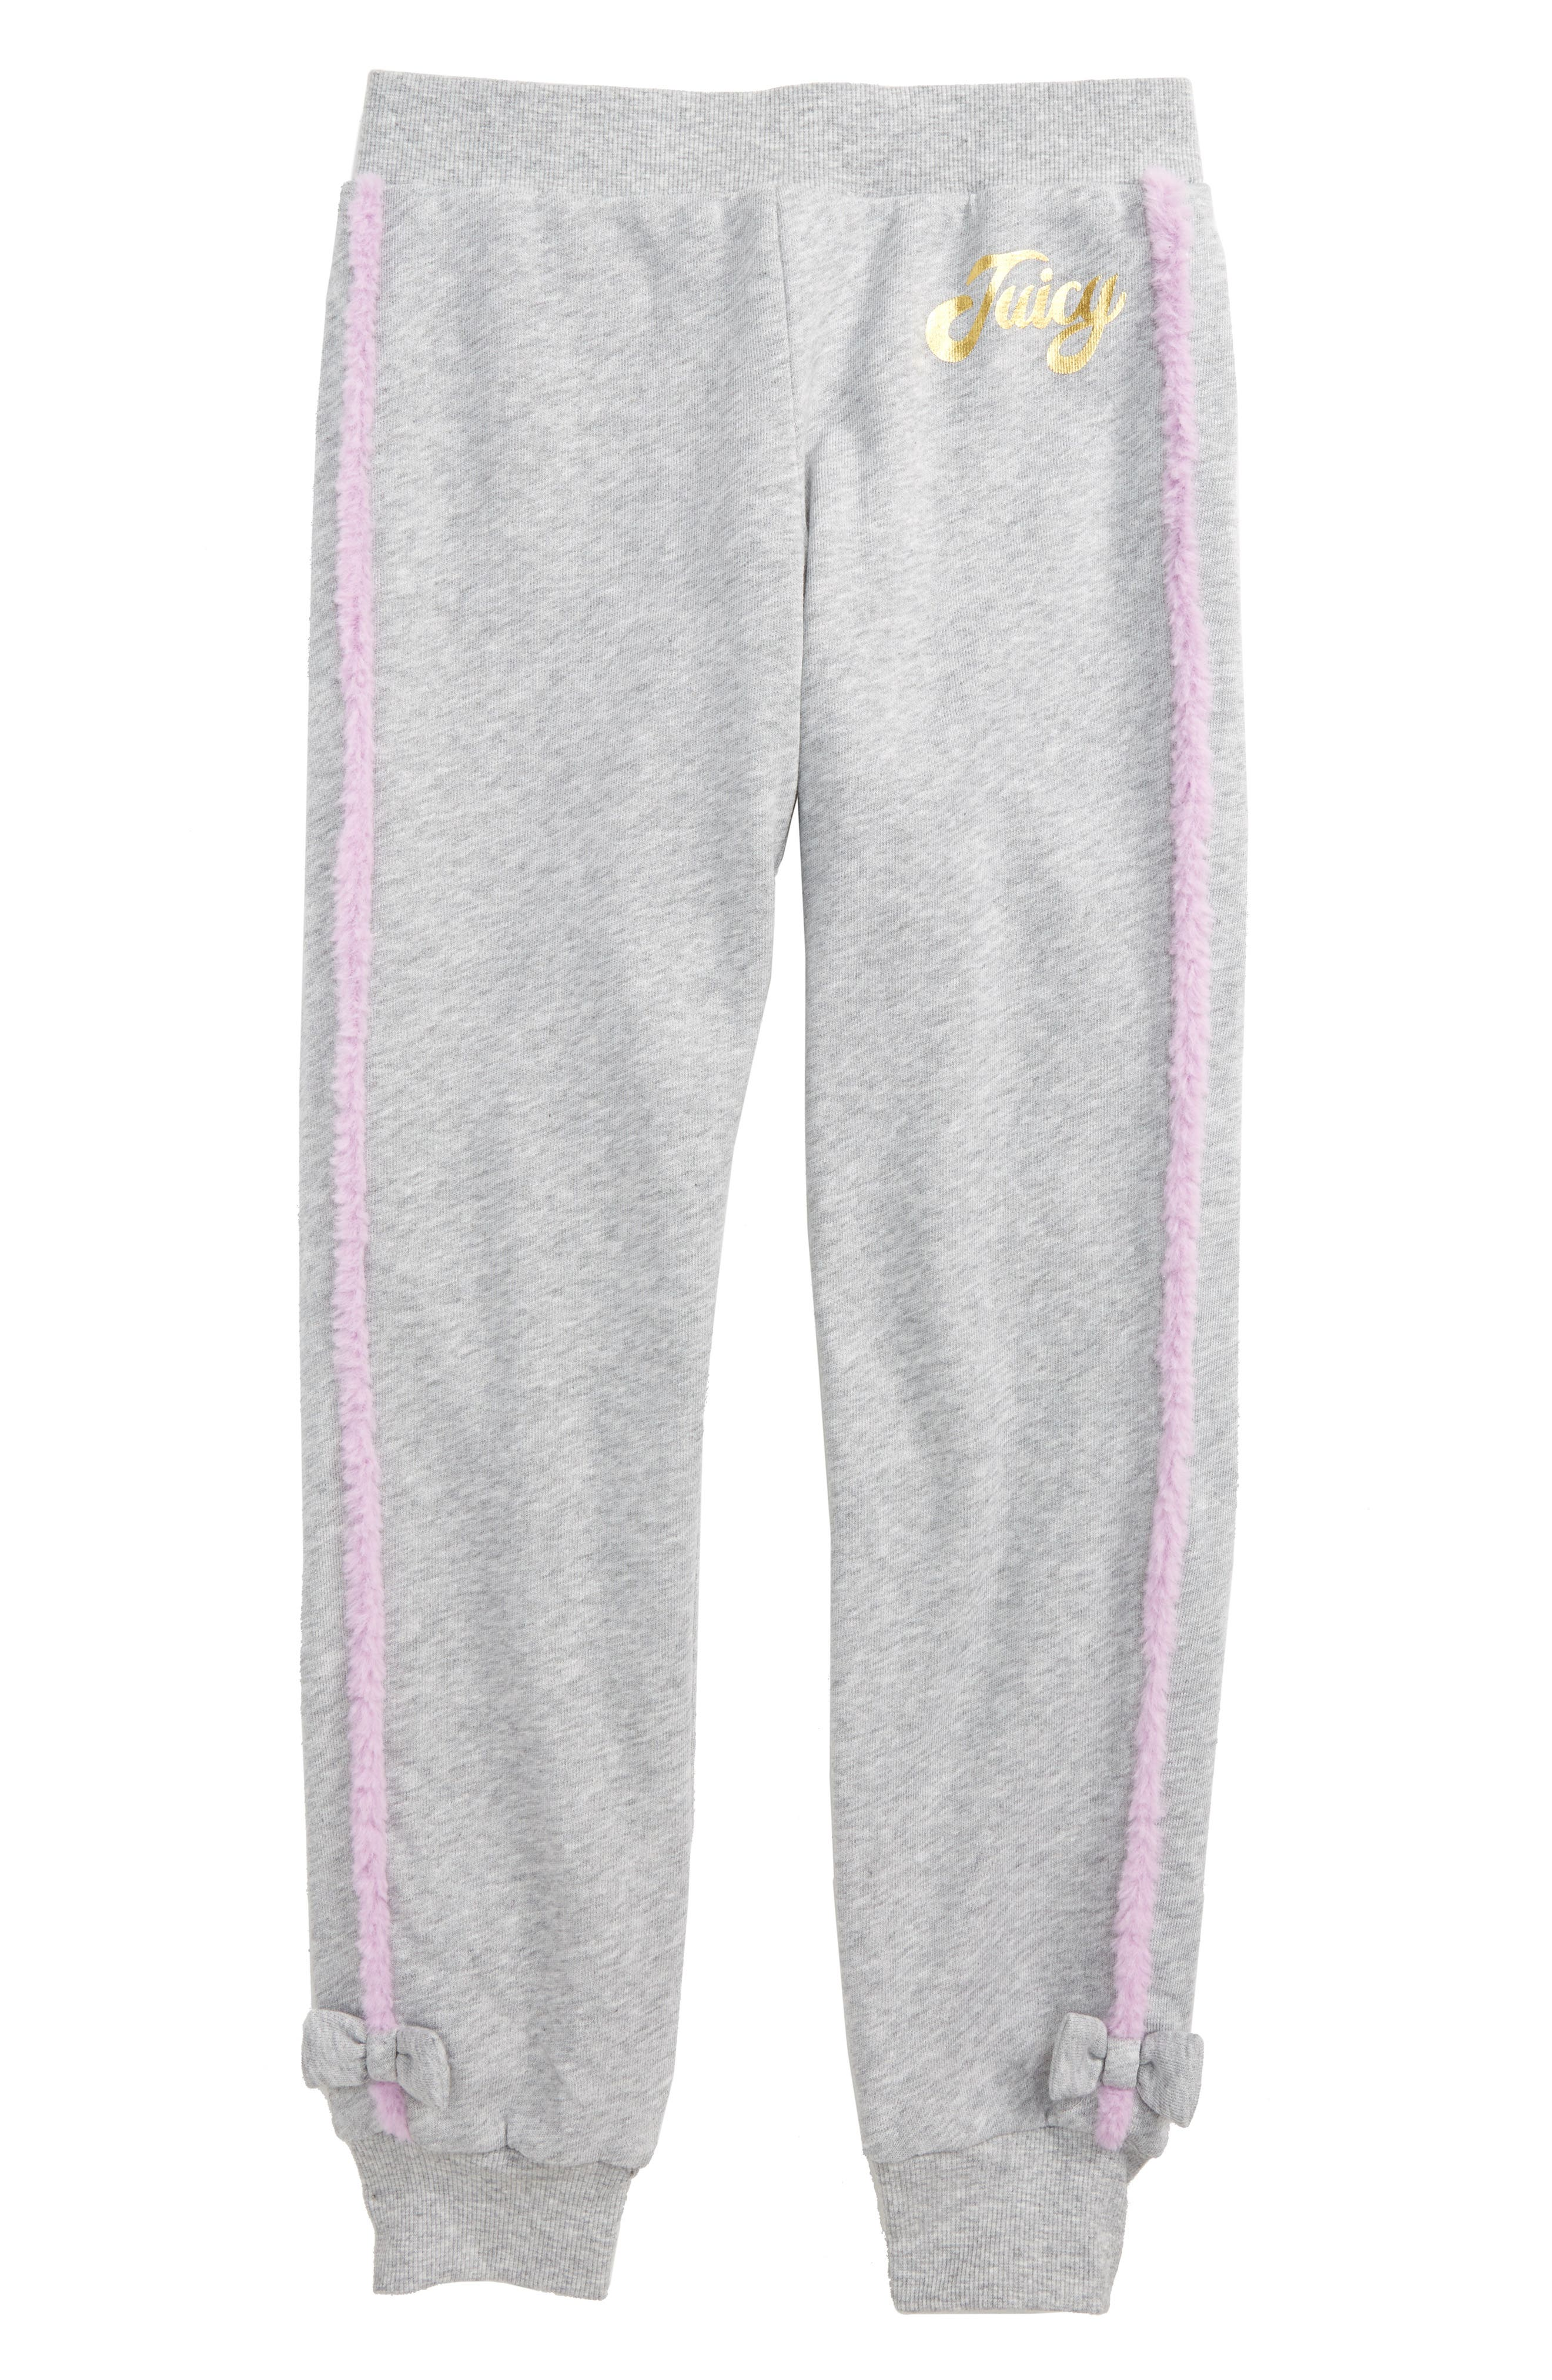 Main Image - Juicy Couture Faux Fur Trim Jogger Pants (Big Girls)